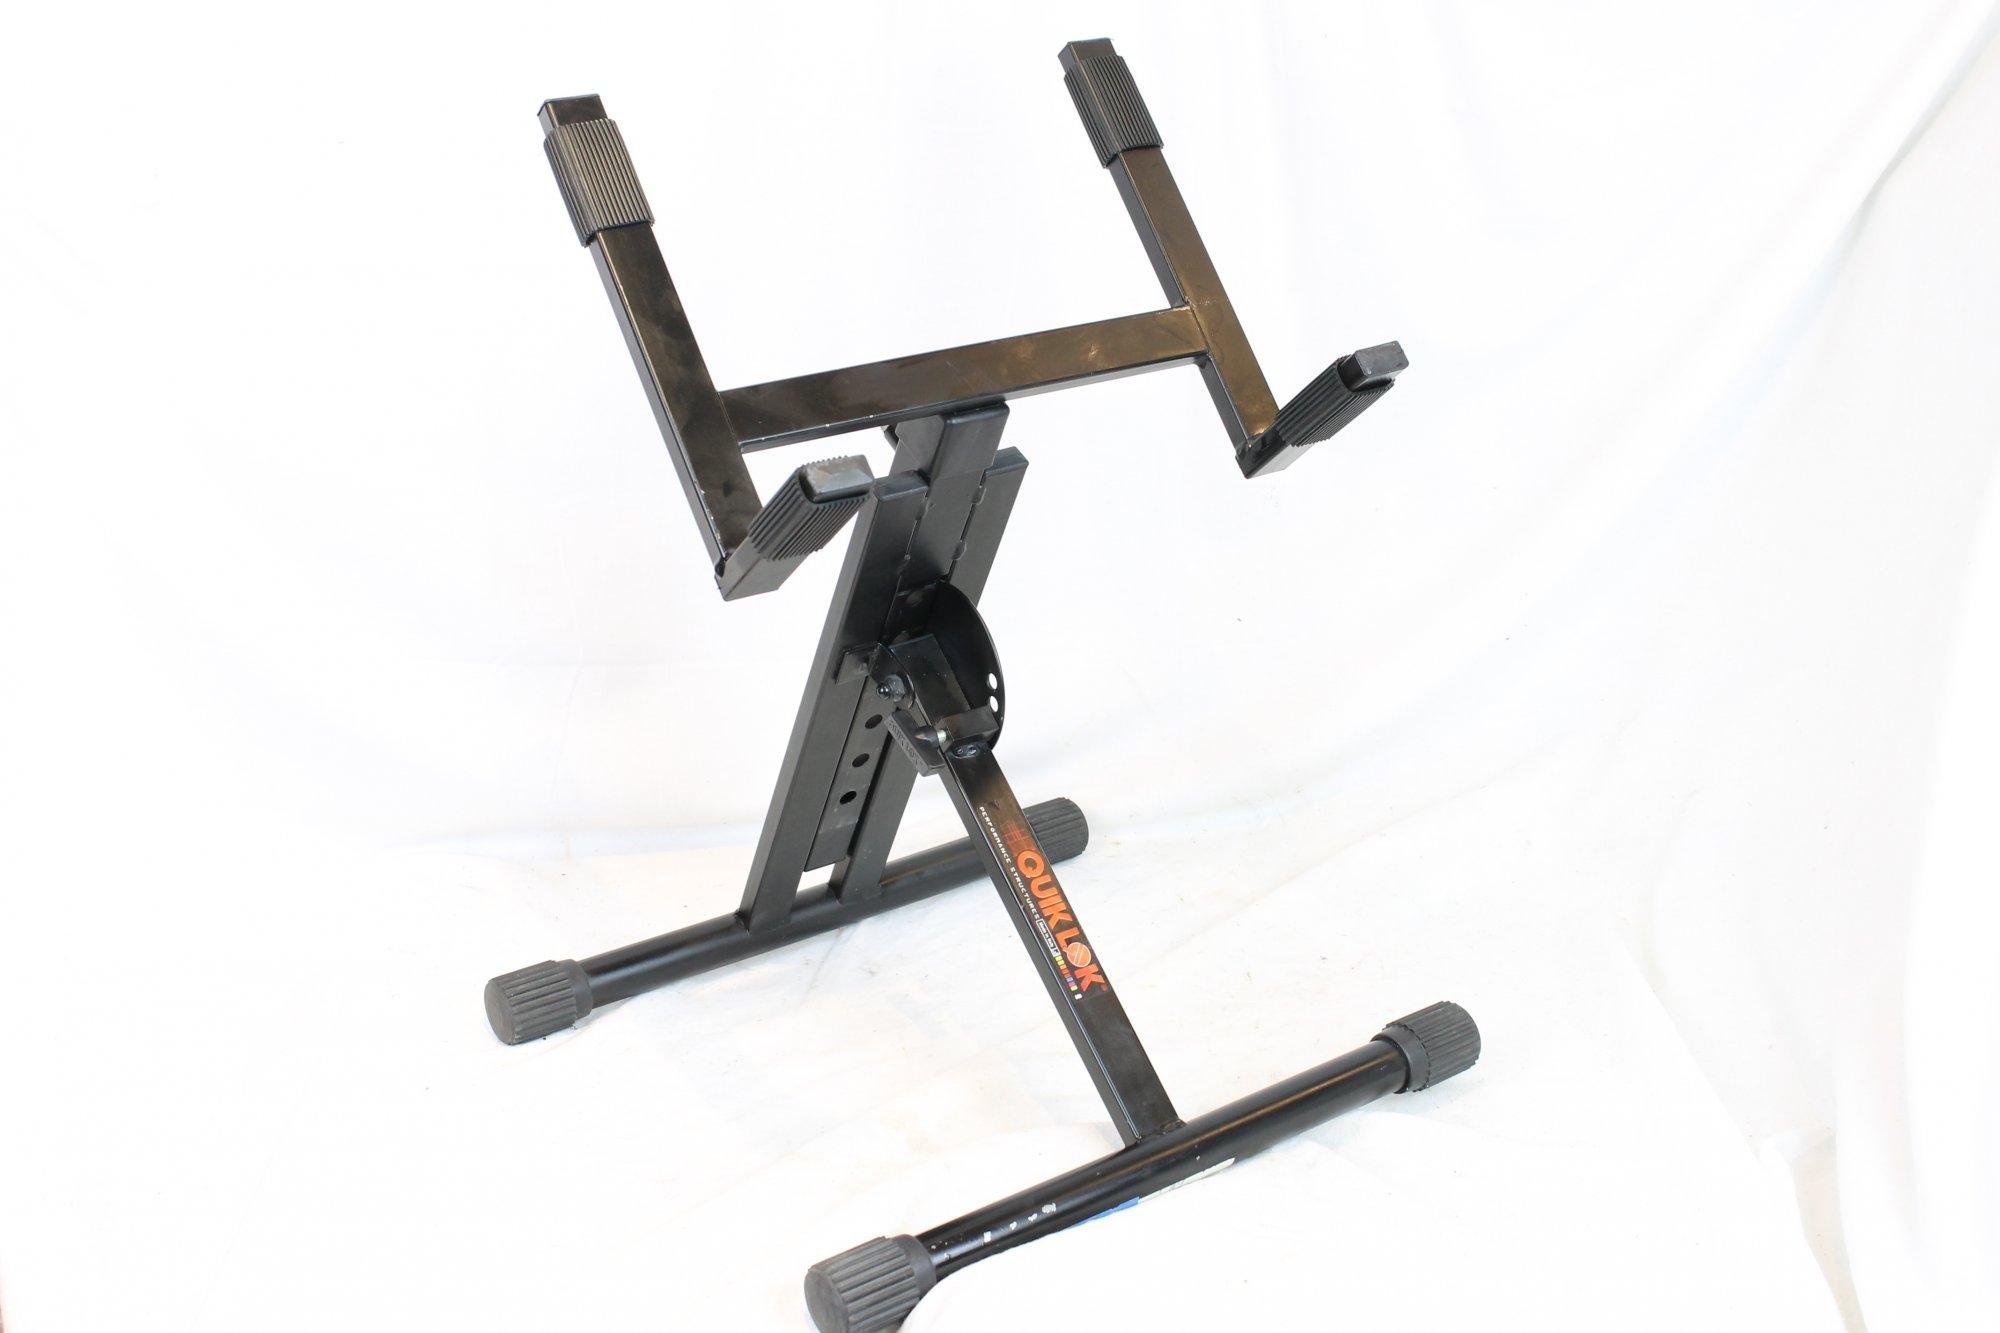 Quiklok Laptop/Arranger Stand for Performance or Practice